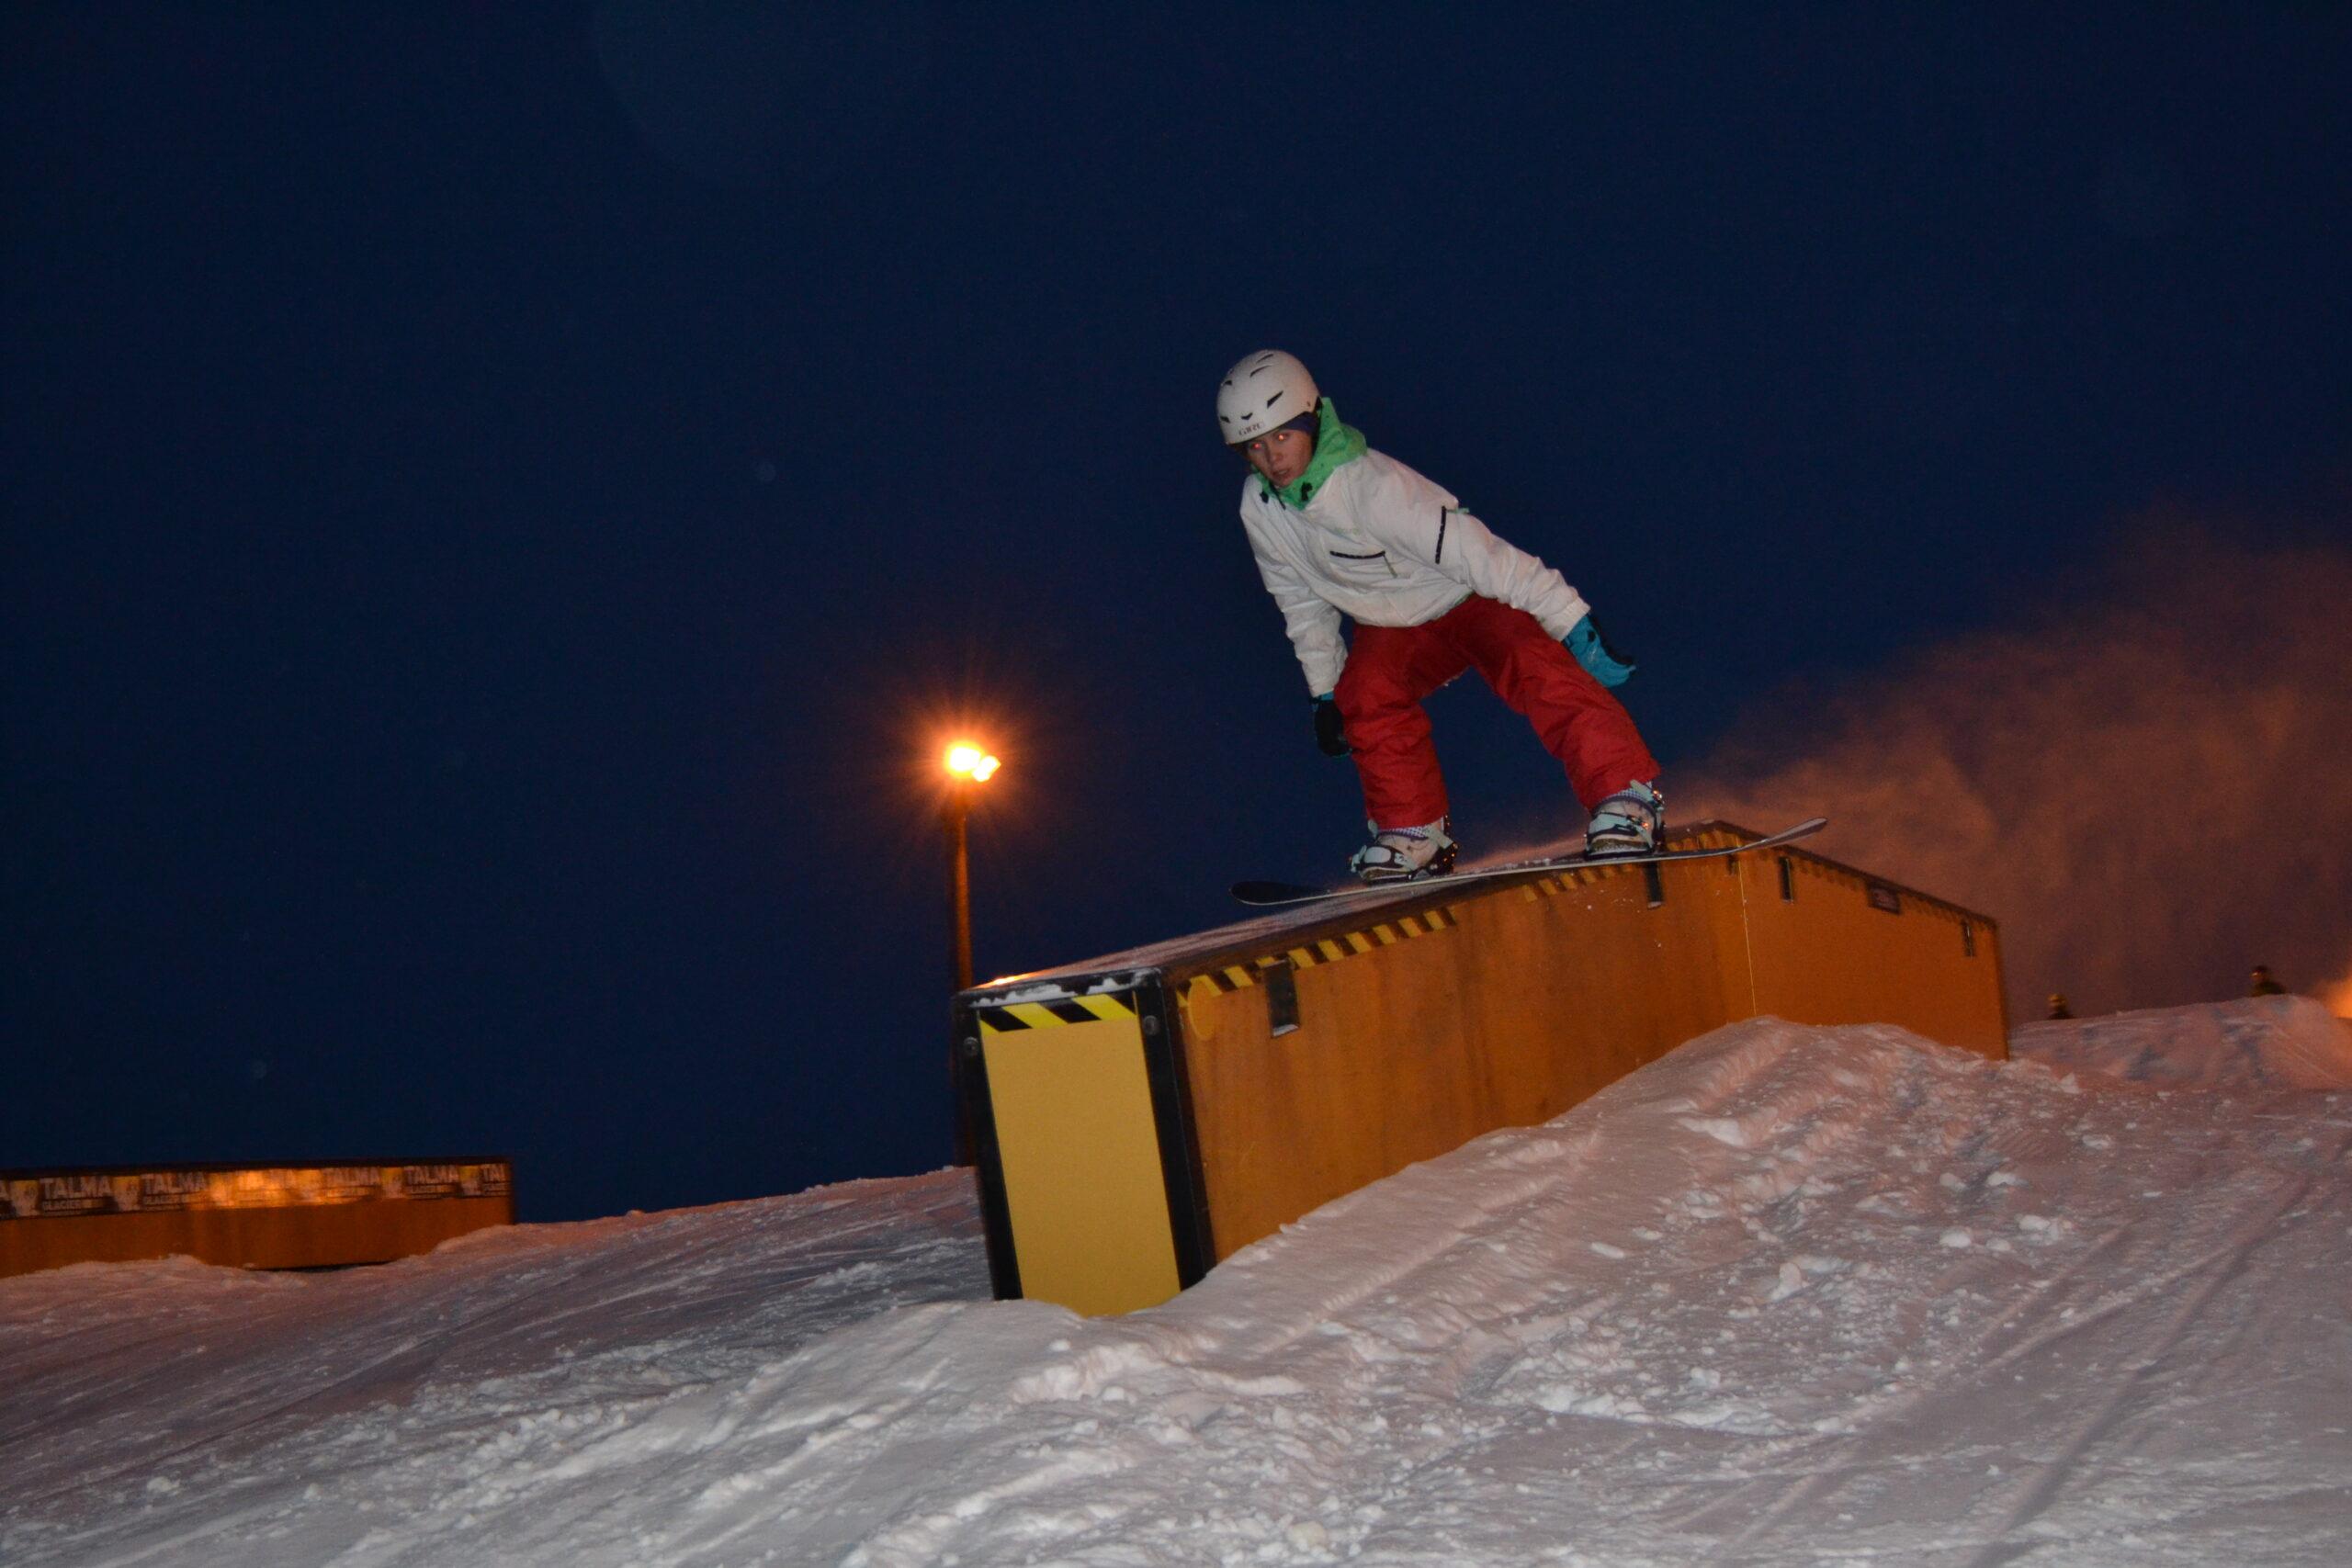 Snowboardkväll vid Talma